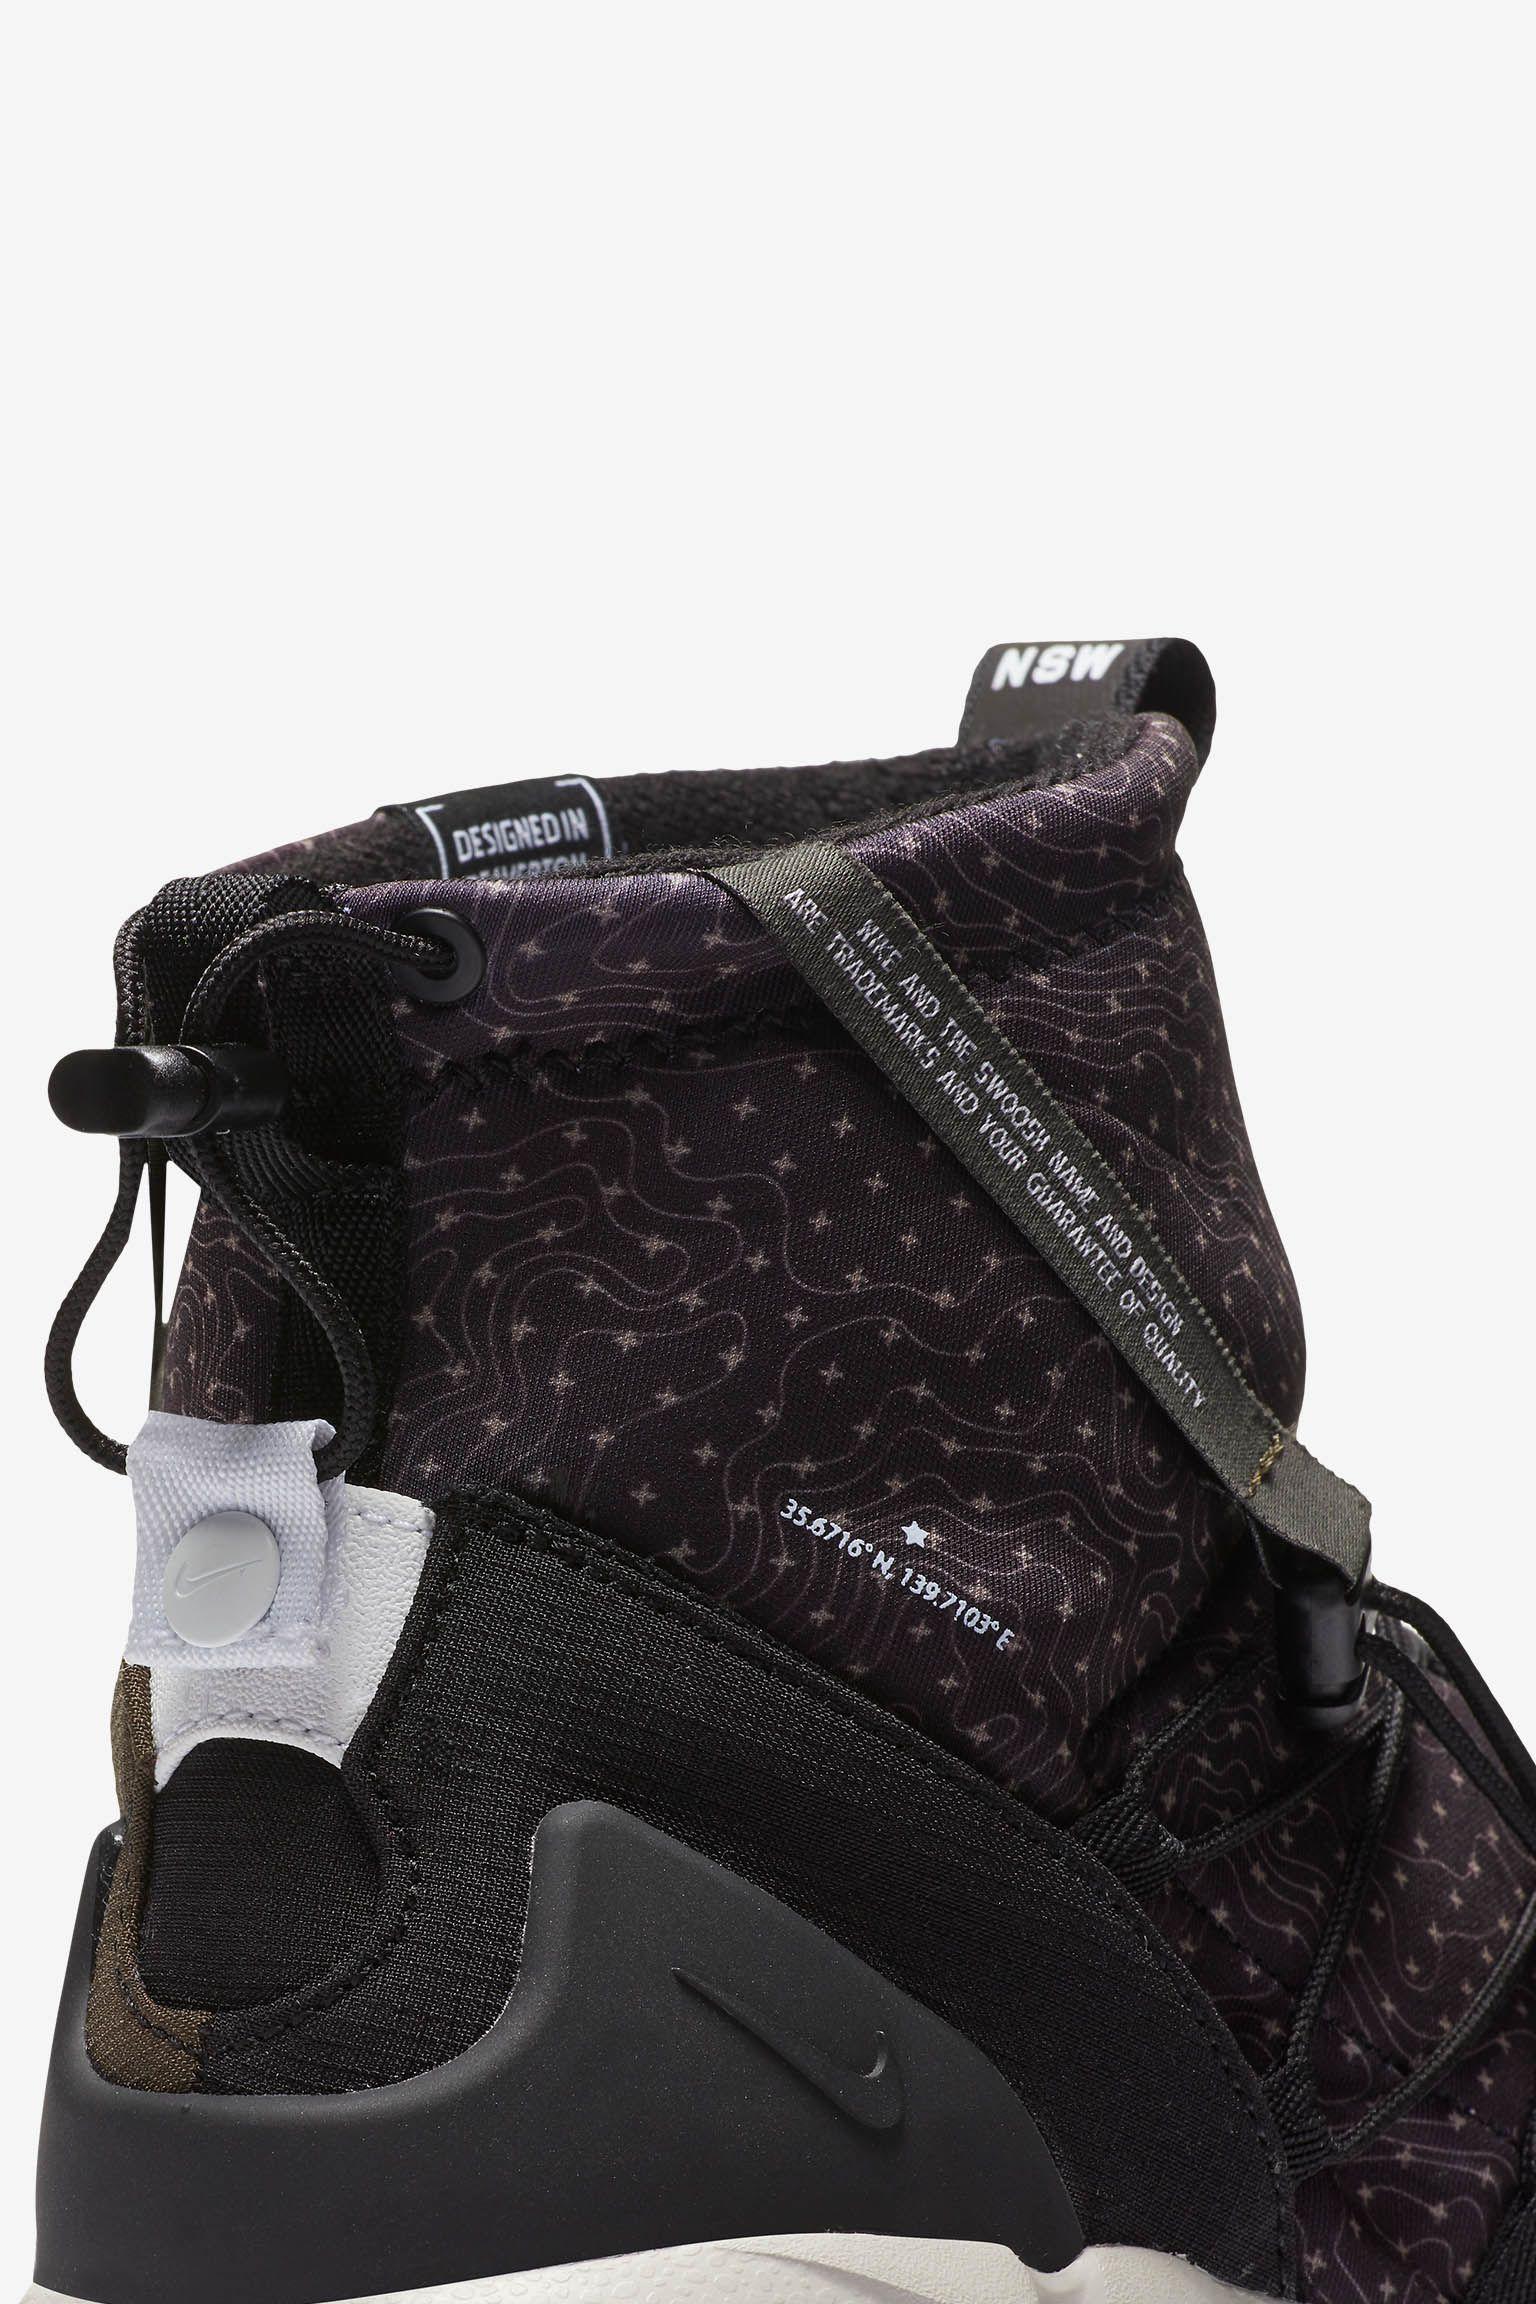 Nike Air Footscape Mid Utility 'Black & Cargo Khaki' Release Date